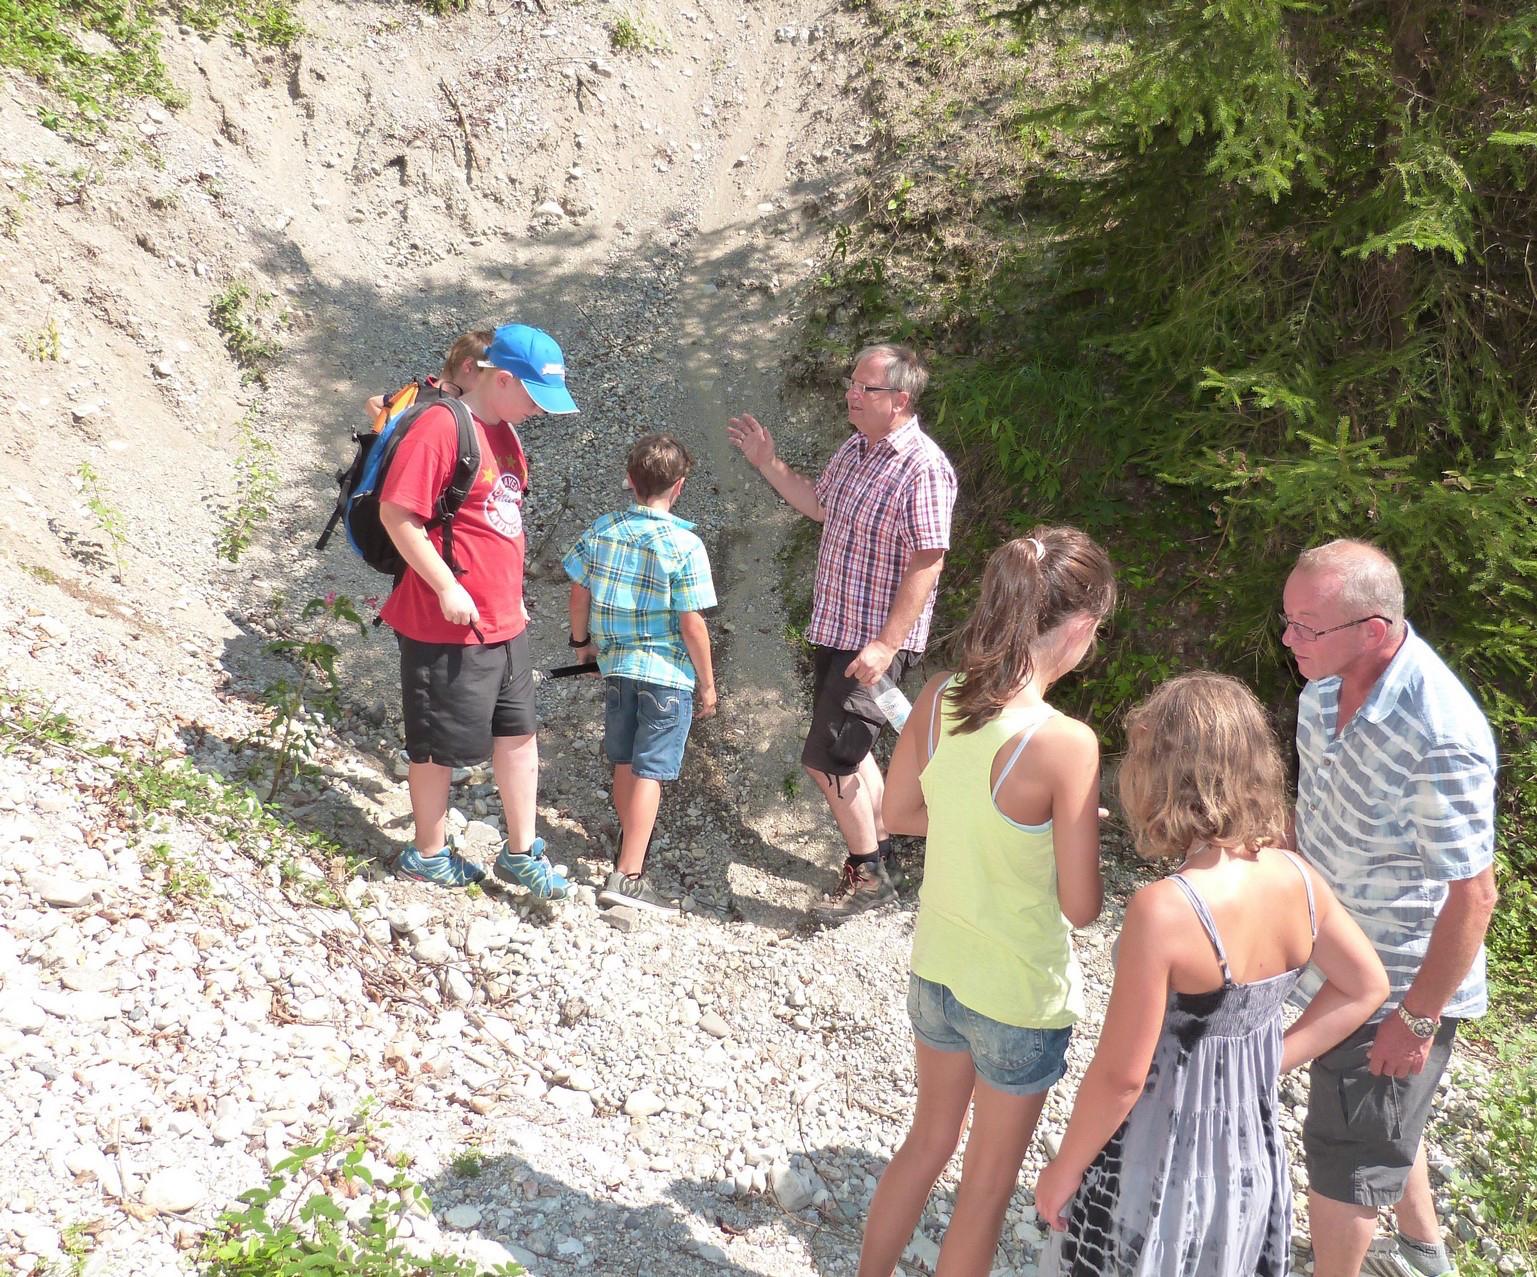 Kinderferienprogramm Grabenstätt Chiemgau-Impakt